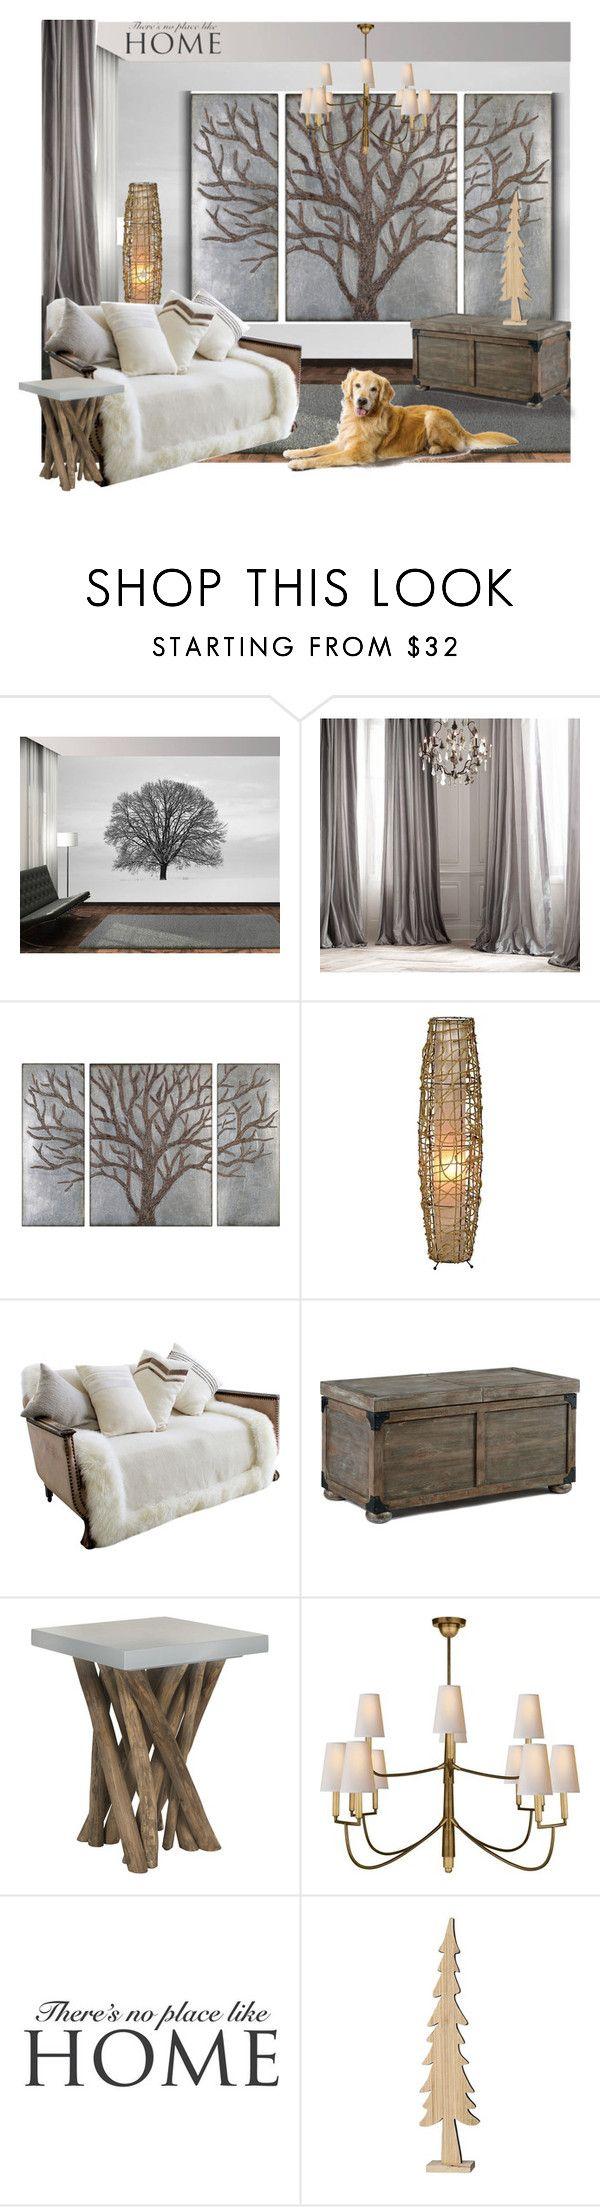 """Untitled #691"" by a-vigh on Polyvore featuring interior, interiors, interior design, thuis, home decor, interior decorating, Restoration Hardware, Pure Lana, Safavieh en Visual Comfort"